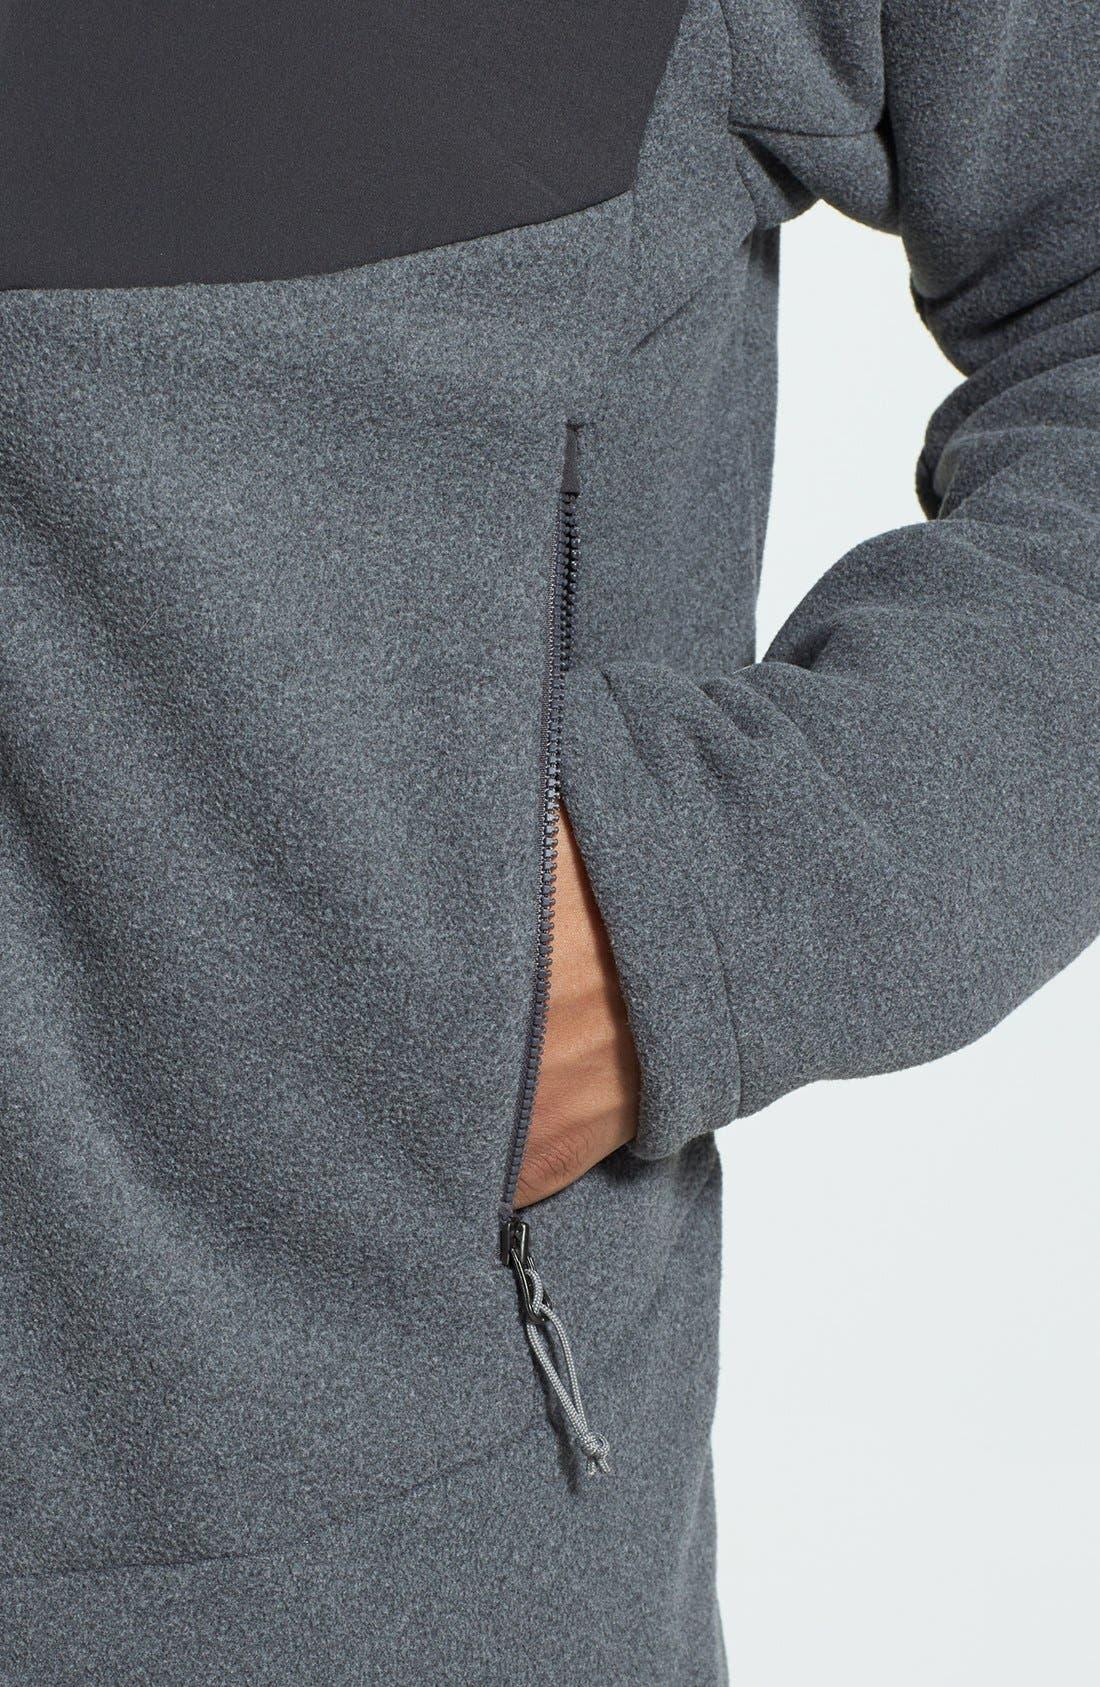 'Chimborazo' Zip Front Fleece Jacket,                             Alternate thumbnail 28, color,